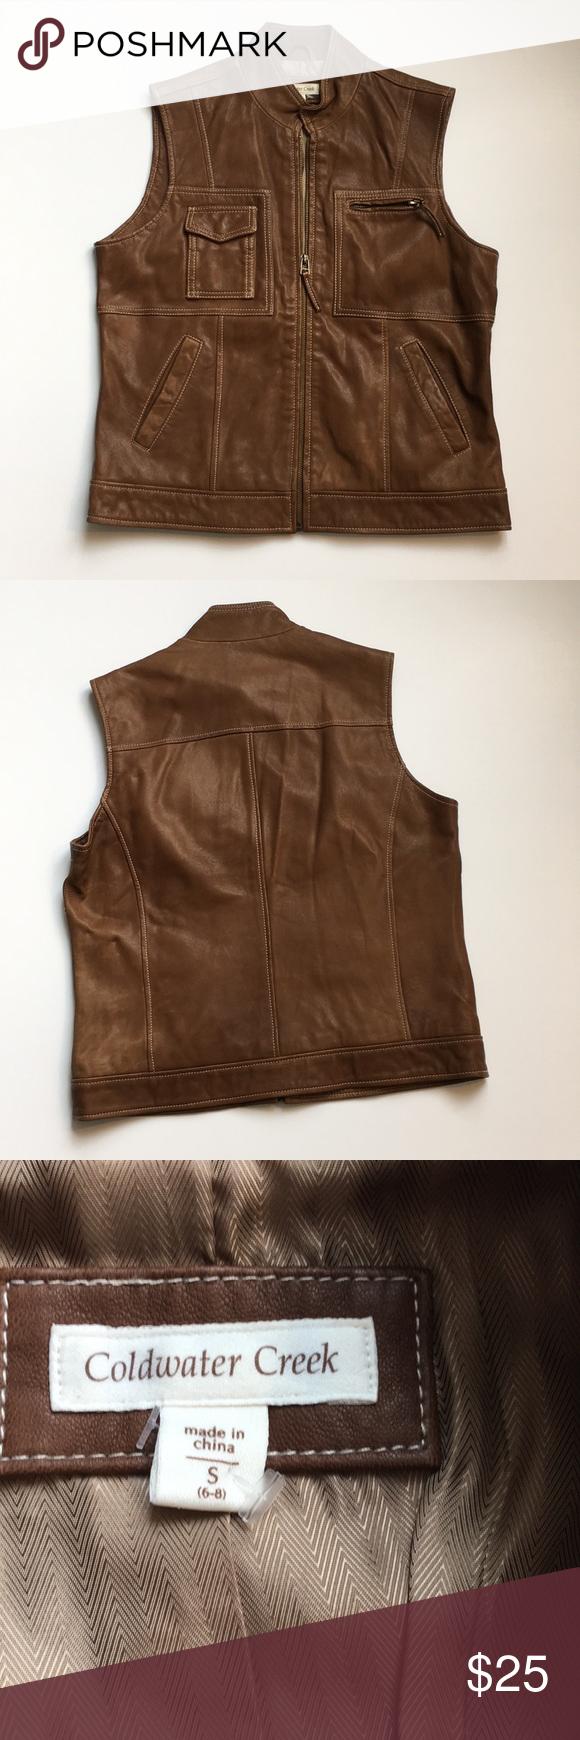 Genuine leather vest pinterest